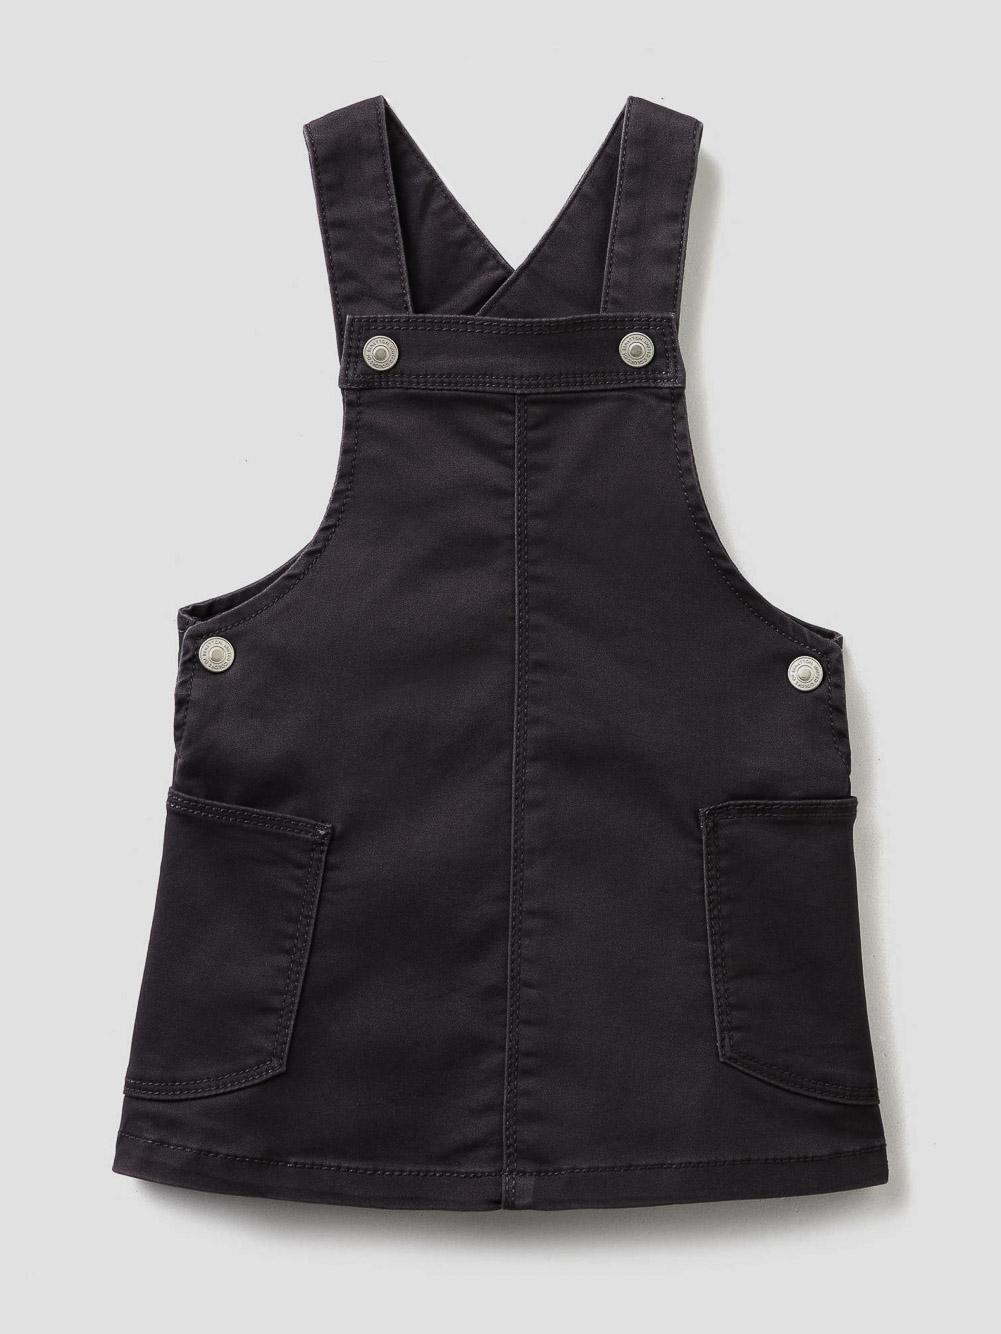 012 BENETTON Φούστα σαλοπέτα με τσέπες 4JM1582U0 20A041